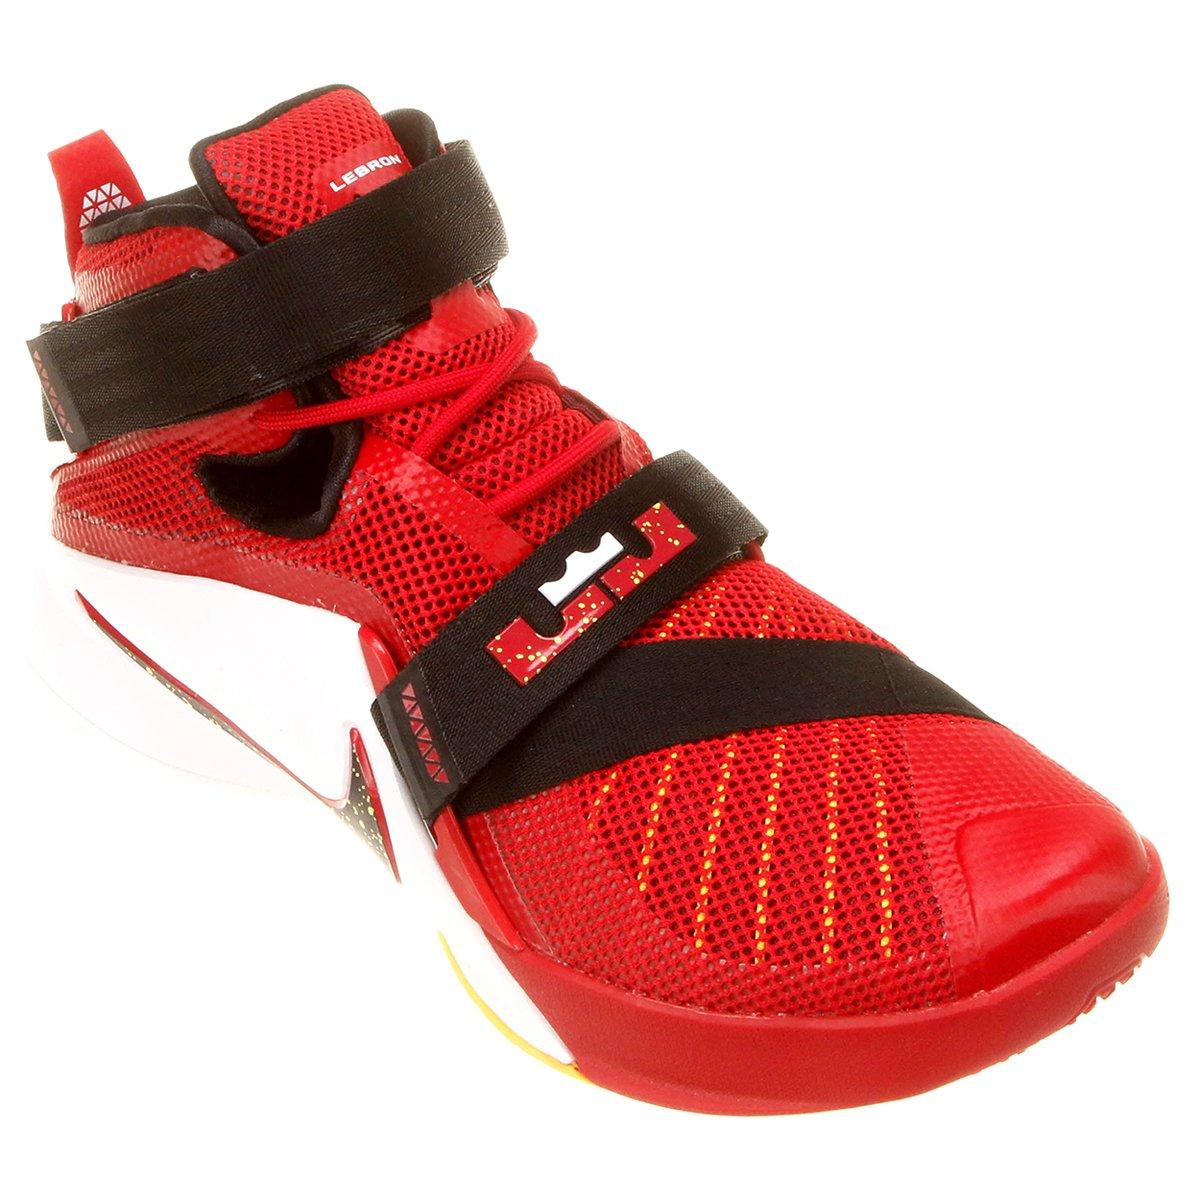 44c16e623aa96 Tênis Nike Lebron Soldier IX - Compre Agora Netshoes ...